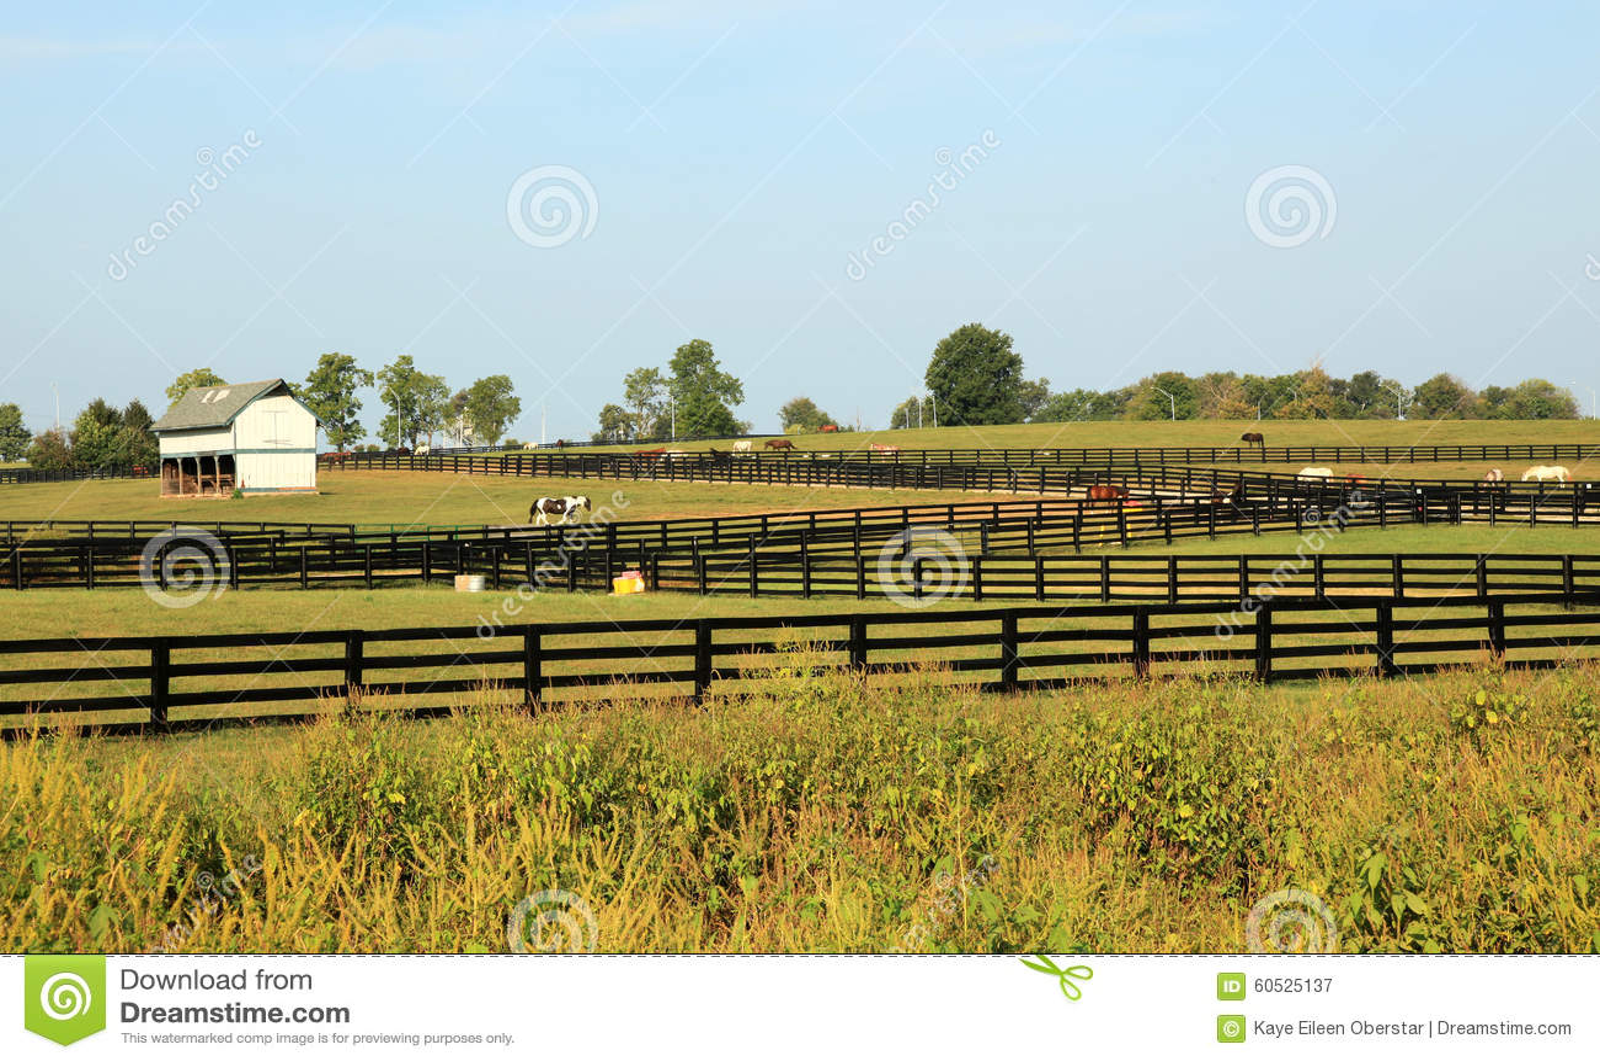 Kentucky Horse Park stock image  Image of bluegrass, region - 60525137